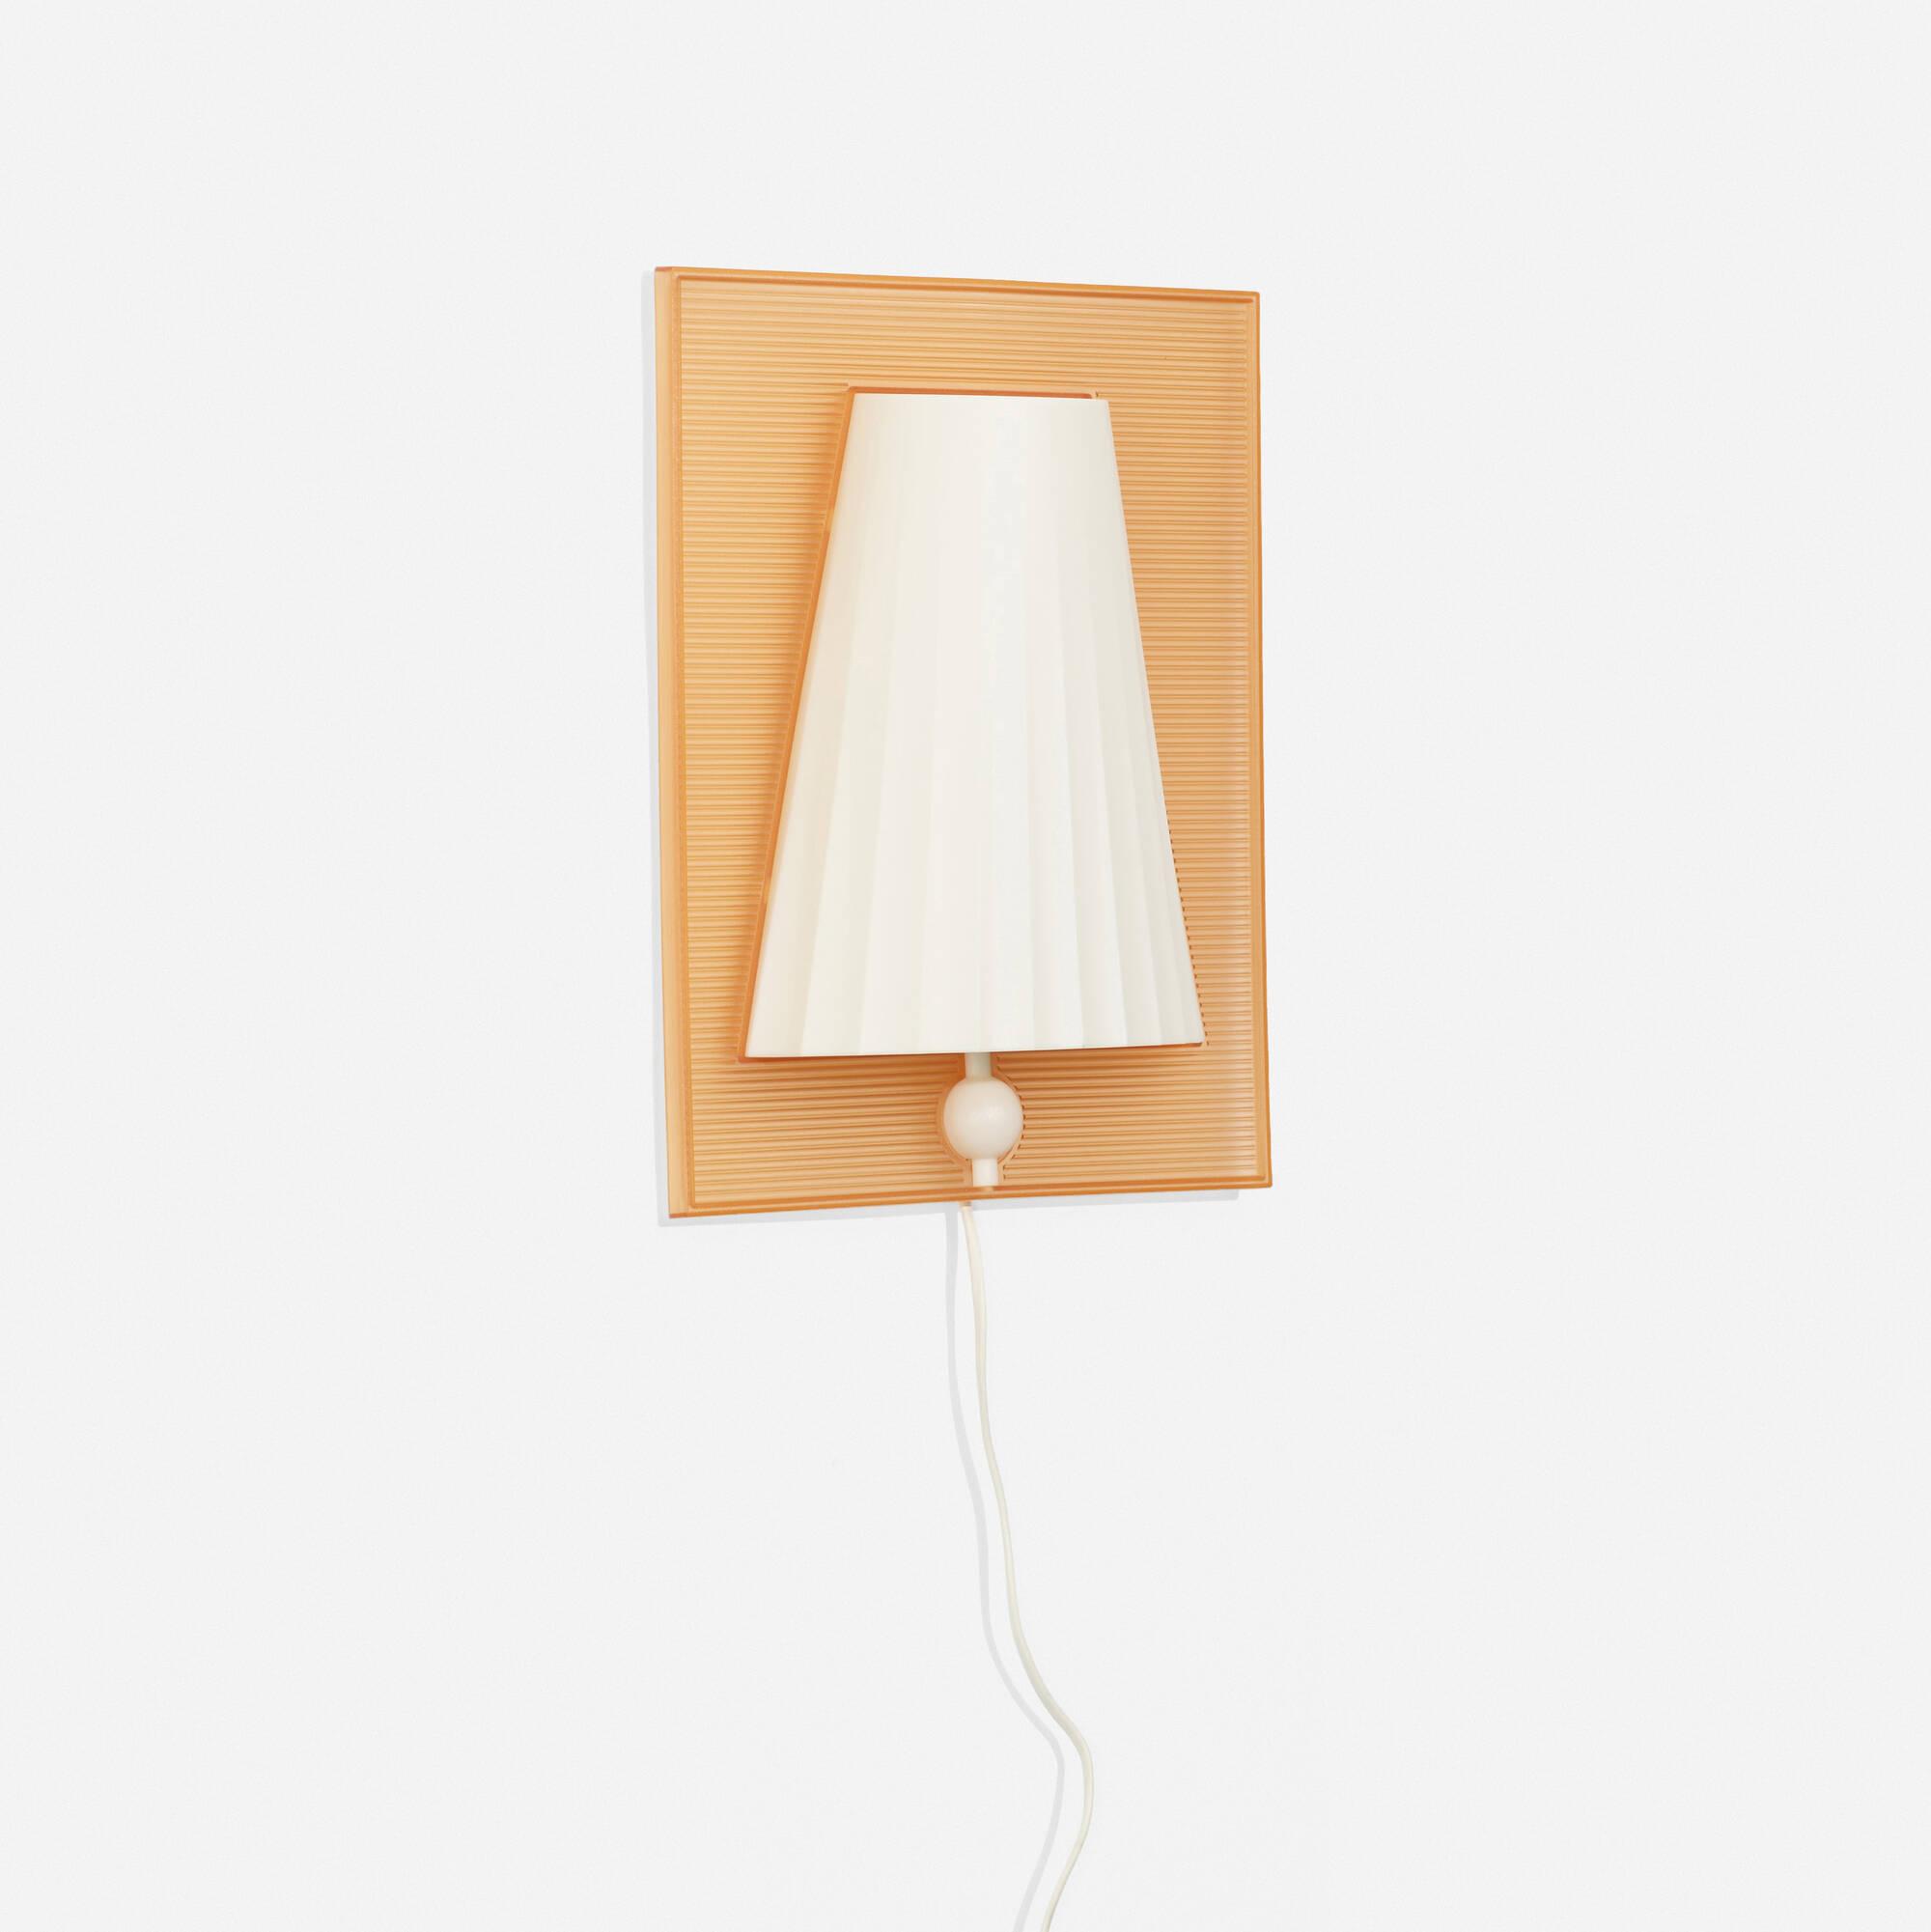 388: Philippe Starck / Walla Walla wall sconce (2 of 2)